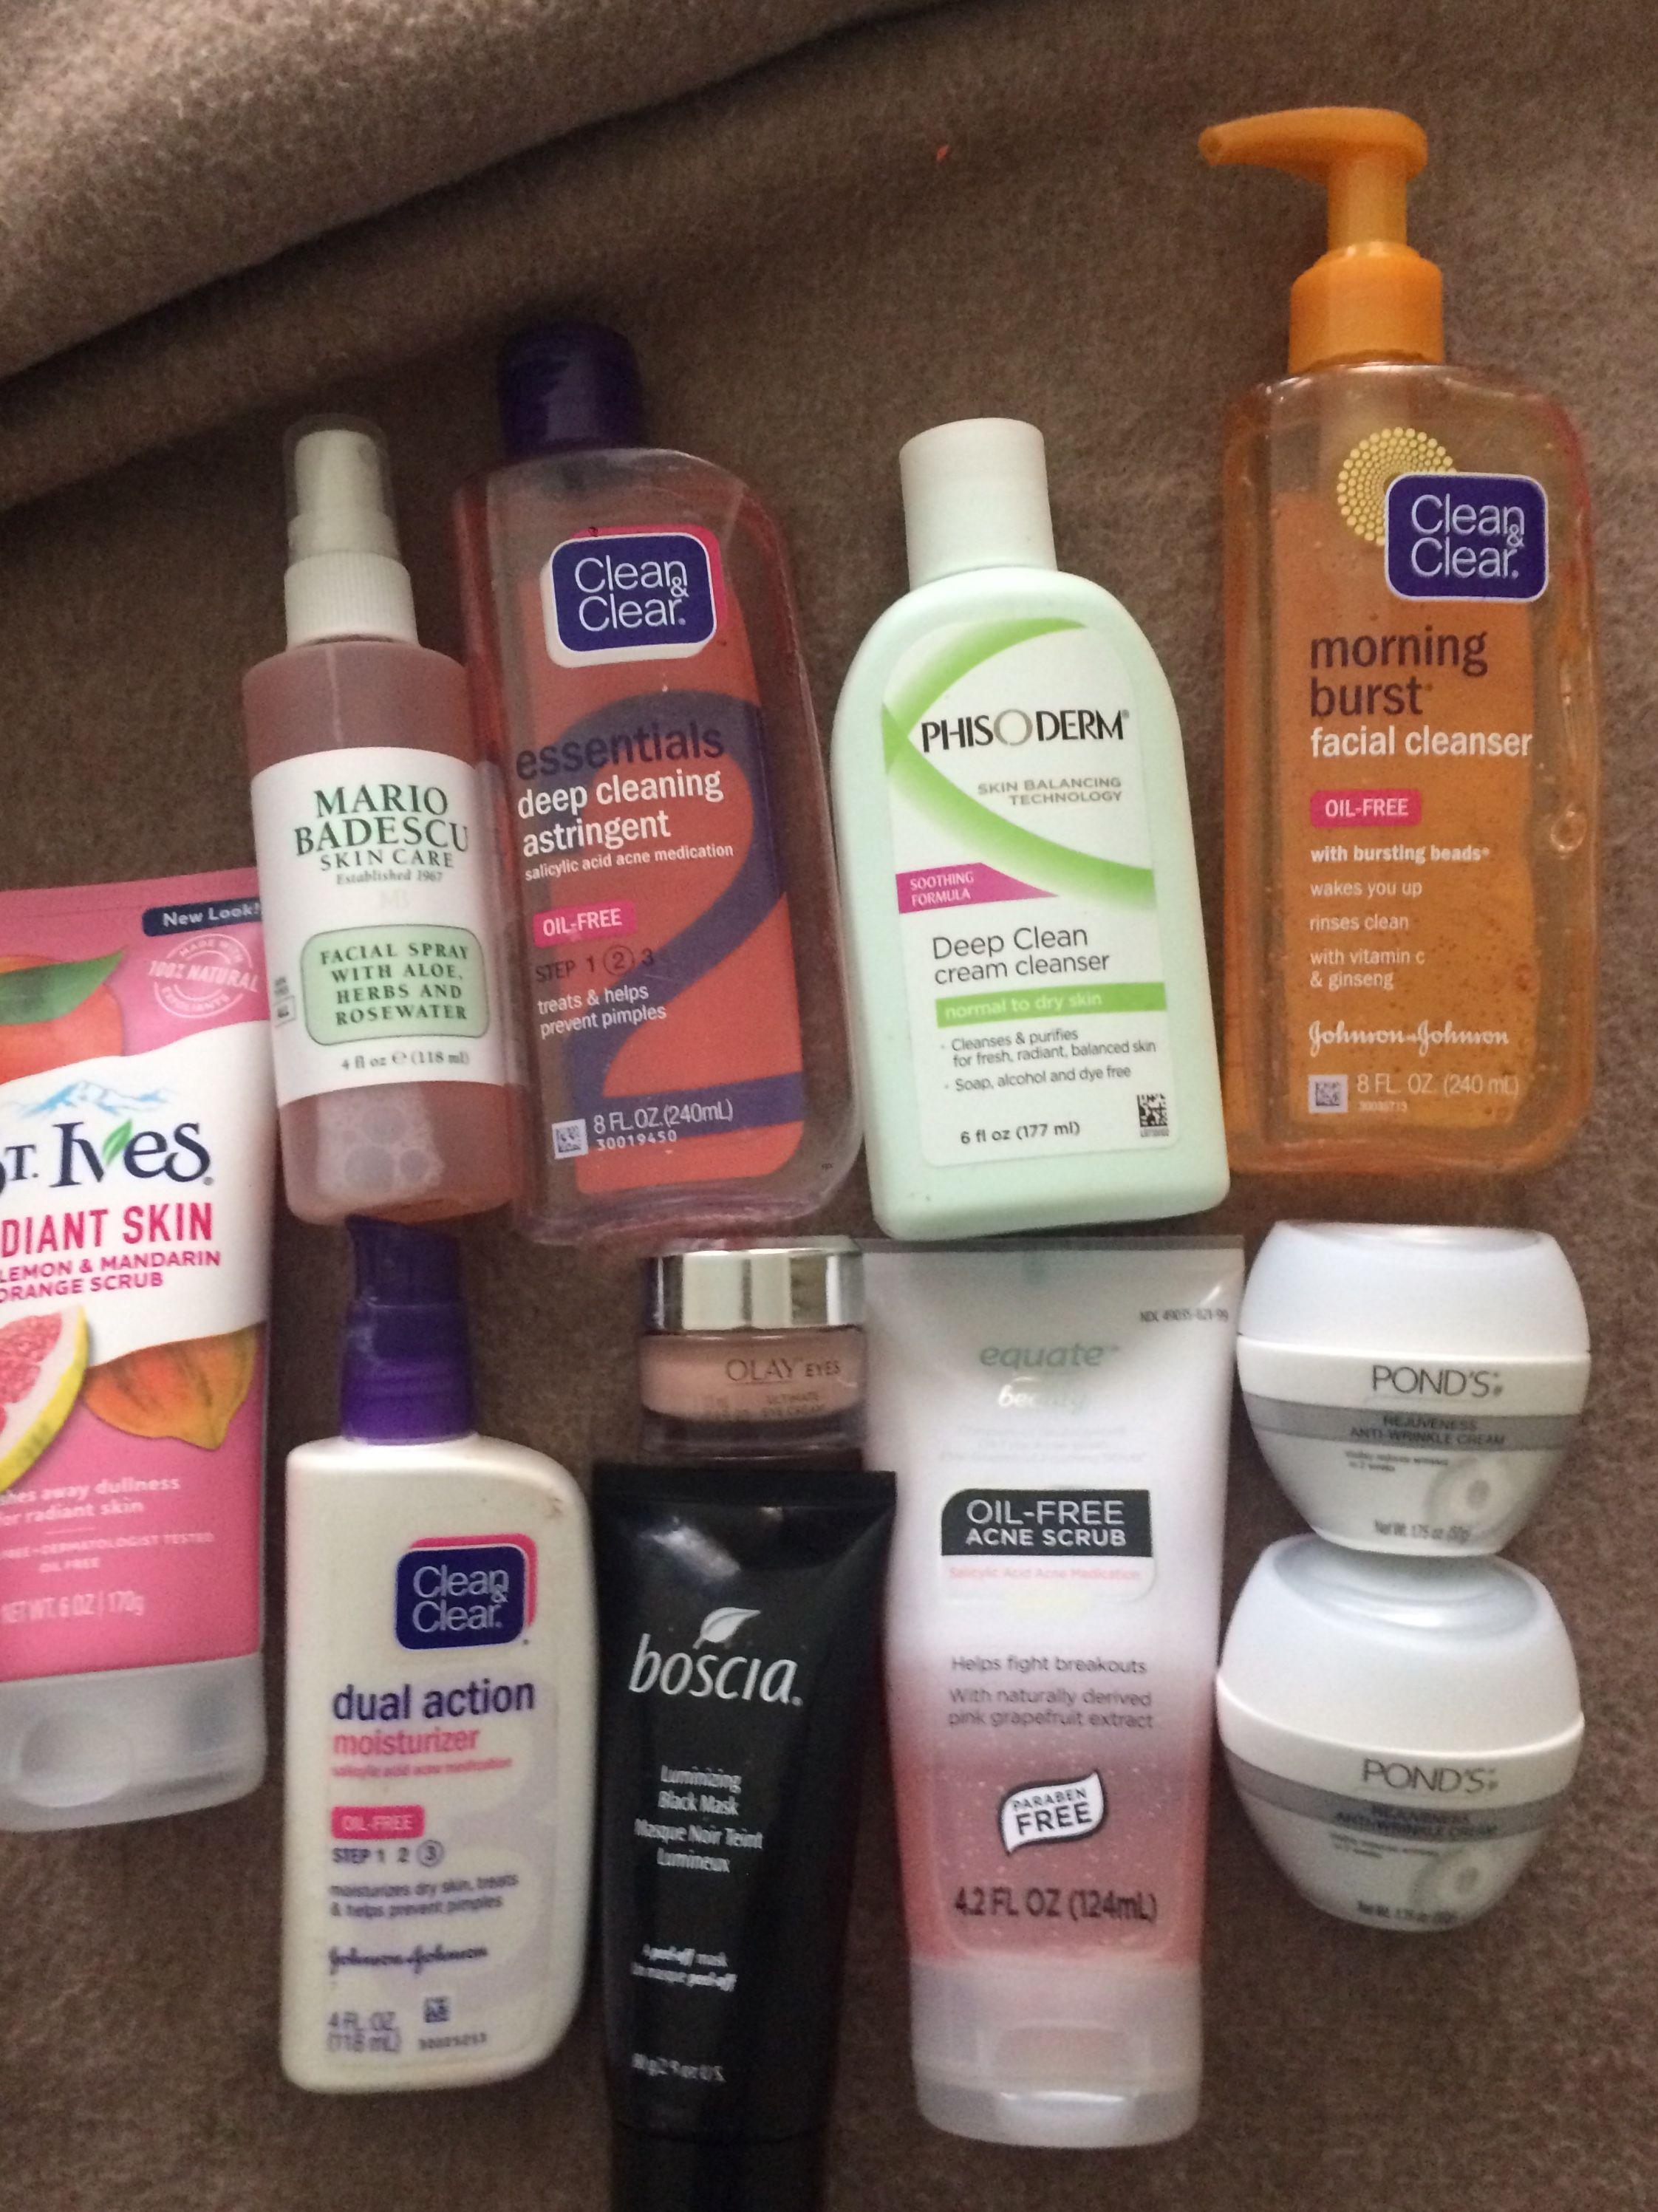 My Current Skincare Regimen Skincare Dryskin Skin Cleanser